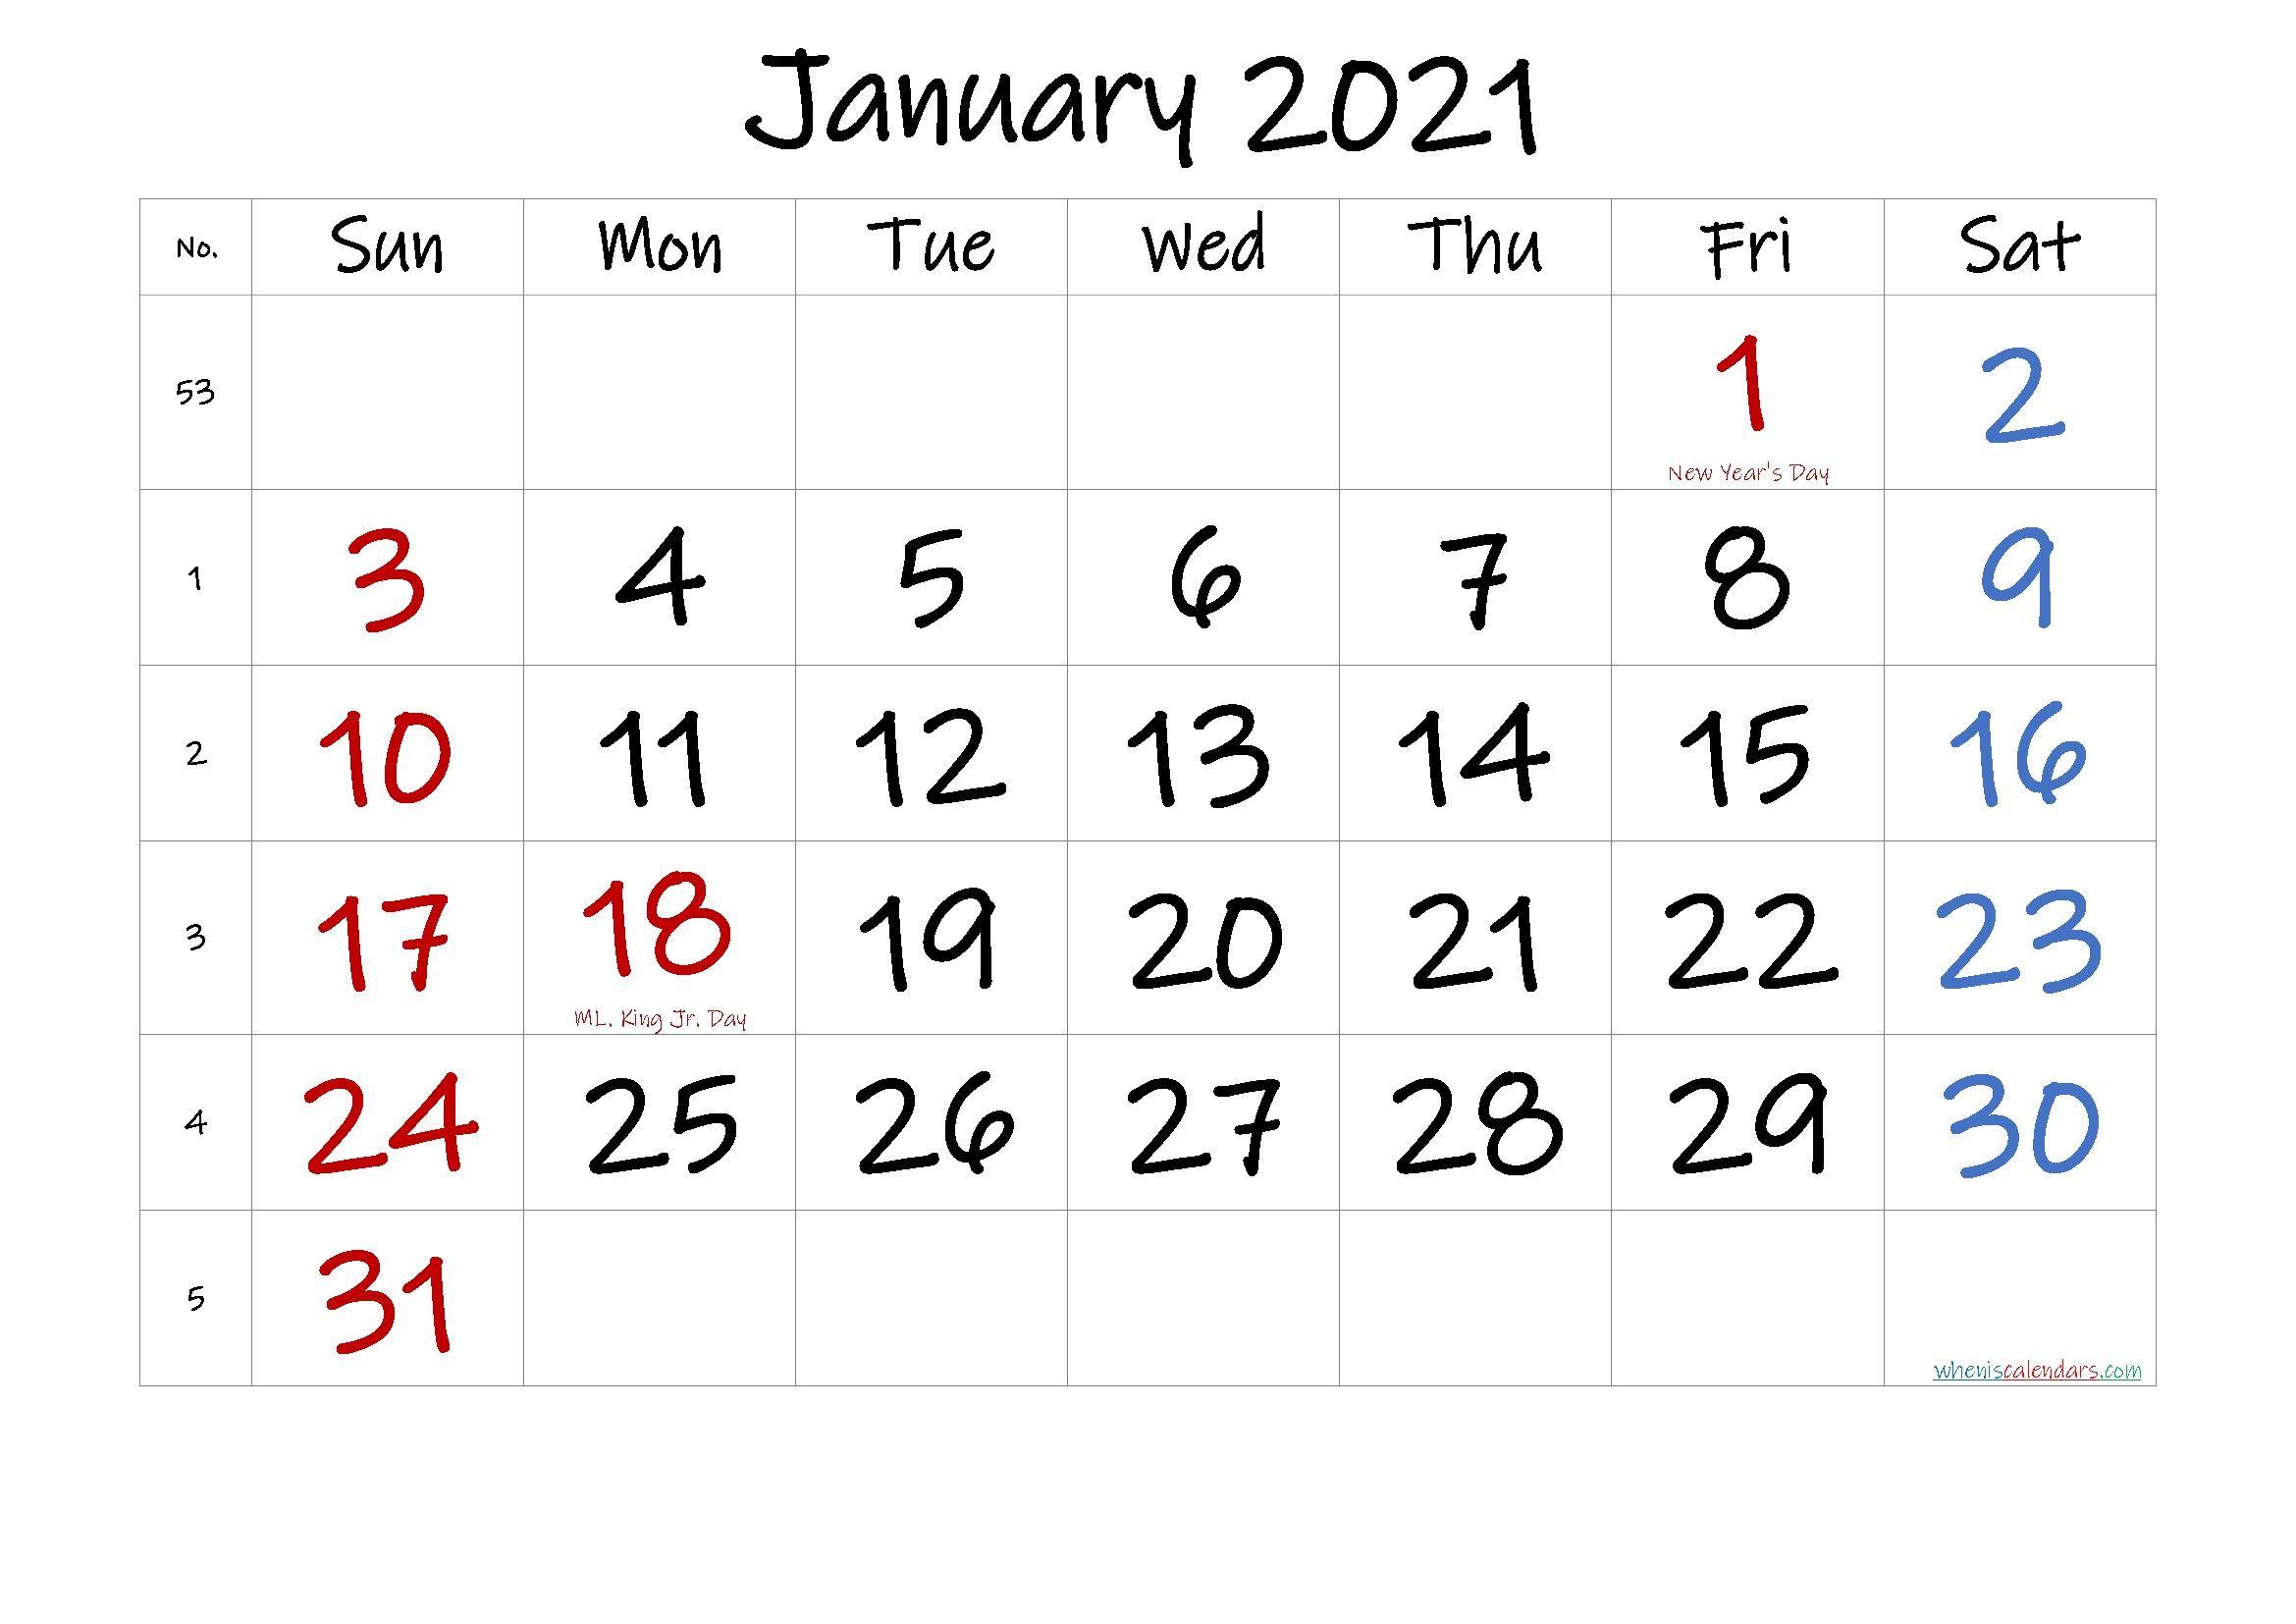 Printable Calendar January 2021 In 2020 | Printable Calendar